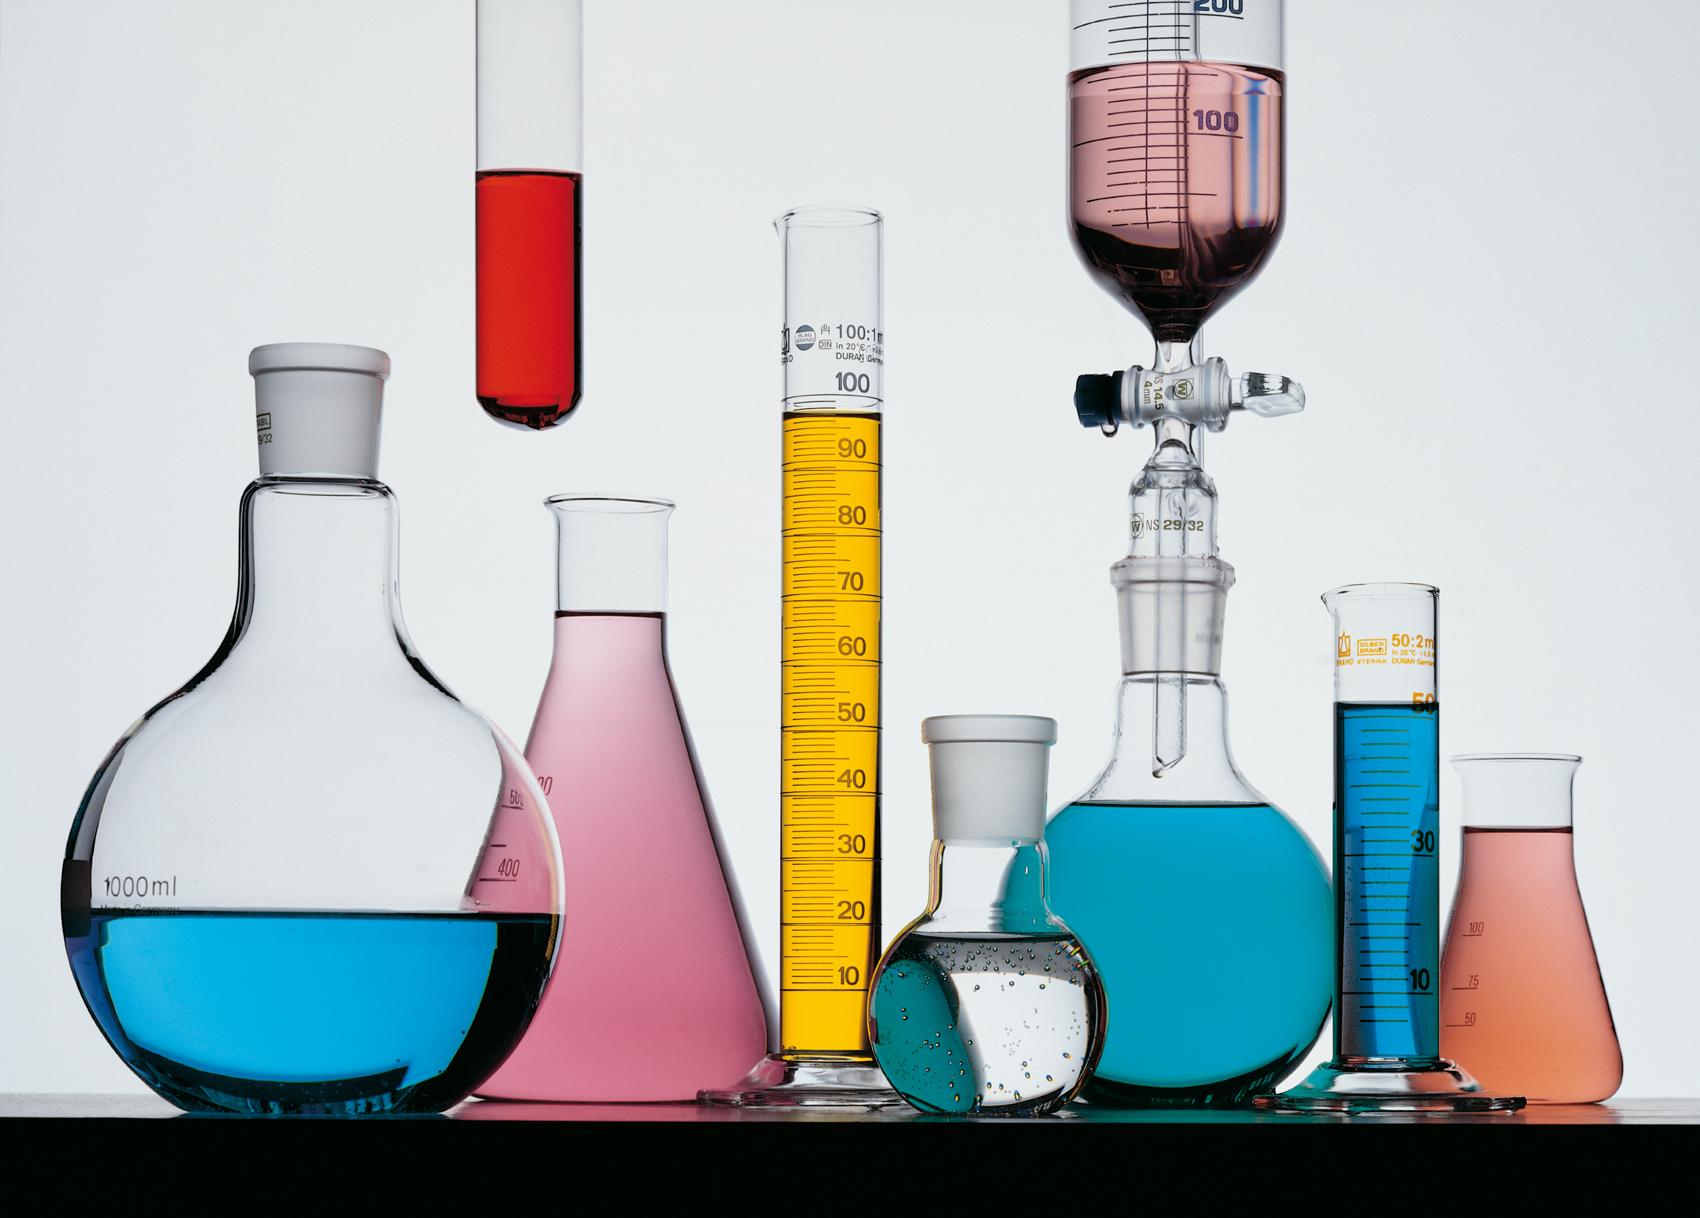 Alkohol Chemie Eigenschaften